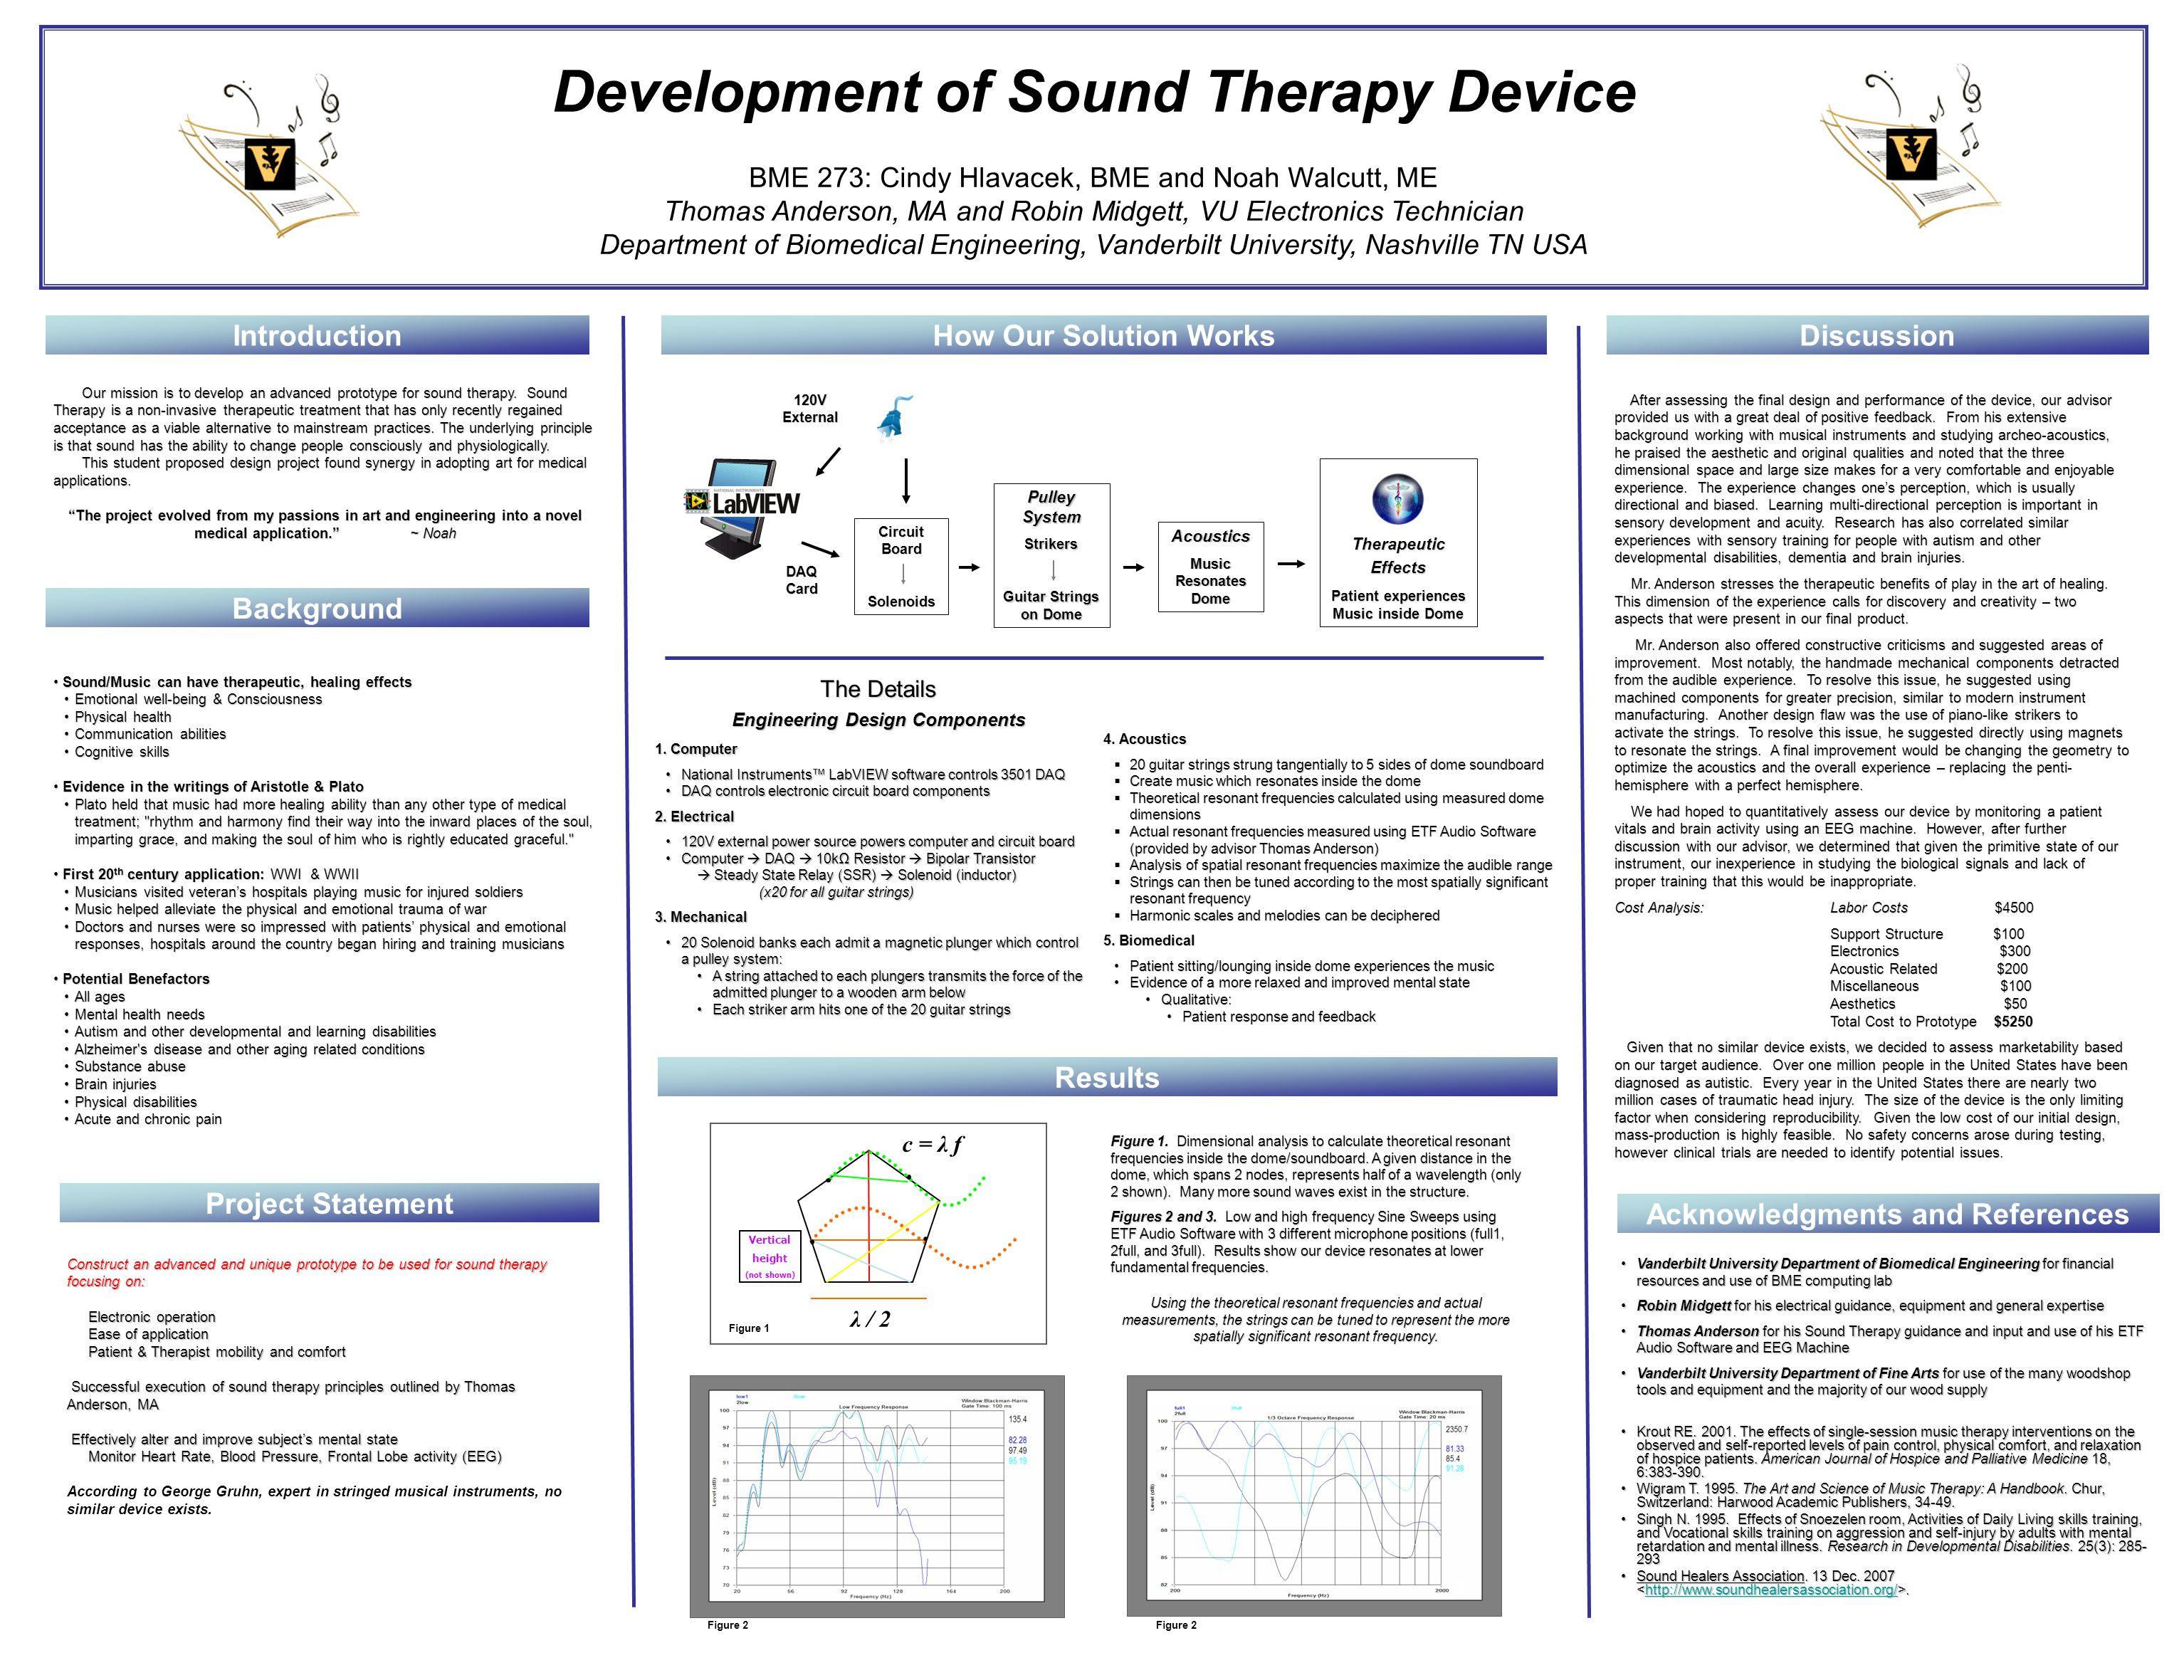 Development of Sound Therapy Device BME 273: Cindy Hlavacek, BME and Noah Walcutt, ME Thomas Anderson, MA and Robin Midgett, VU Electronics Technician